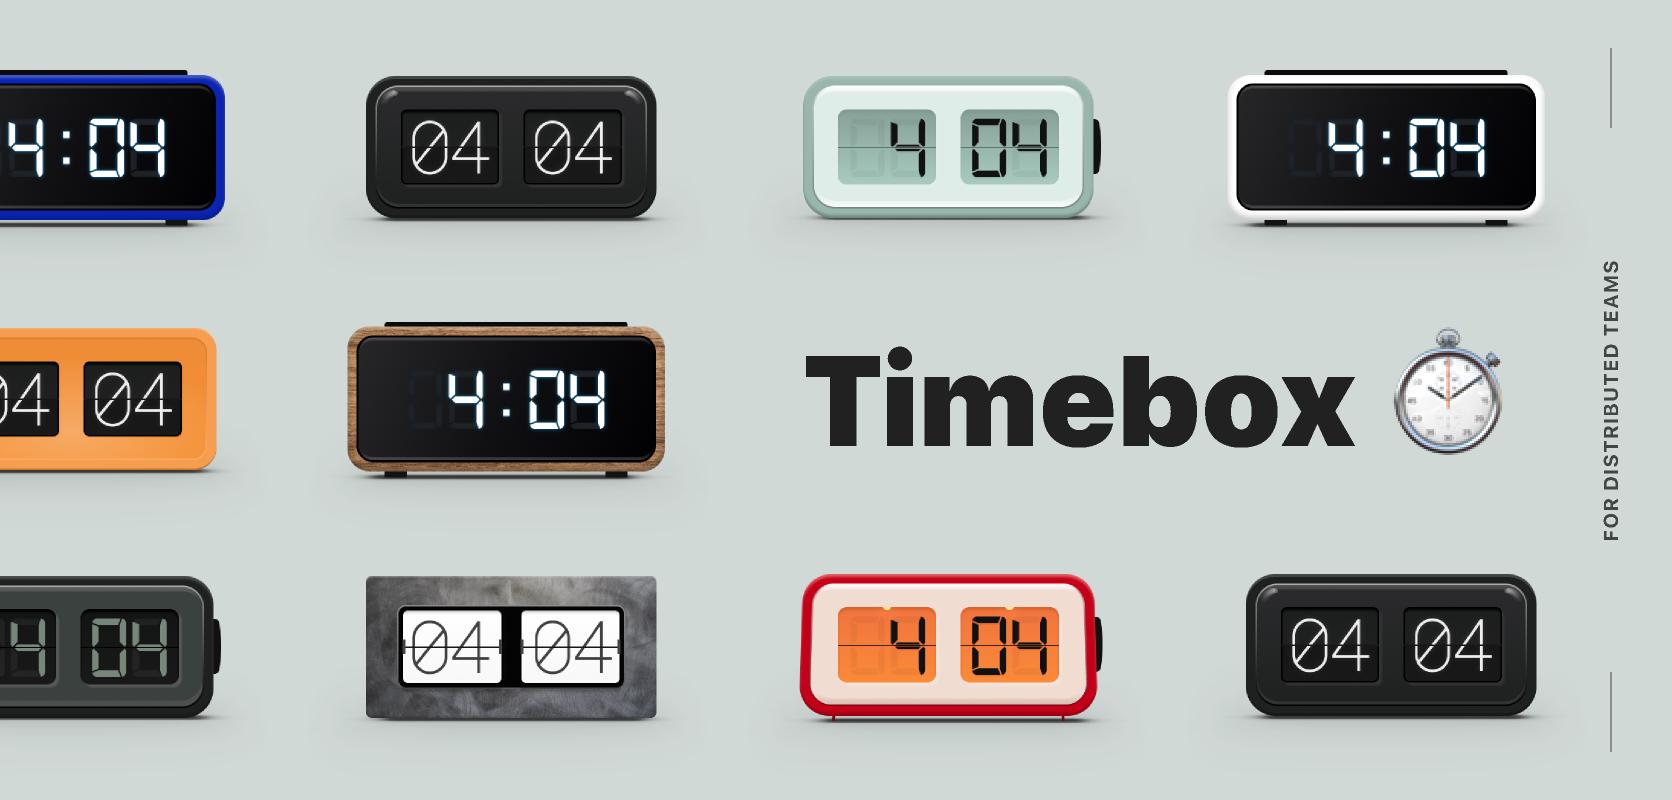 Freebie figma Timebox template